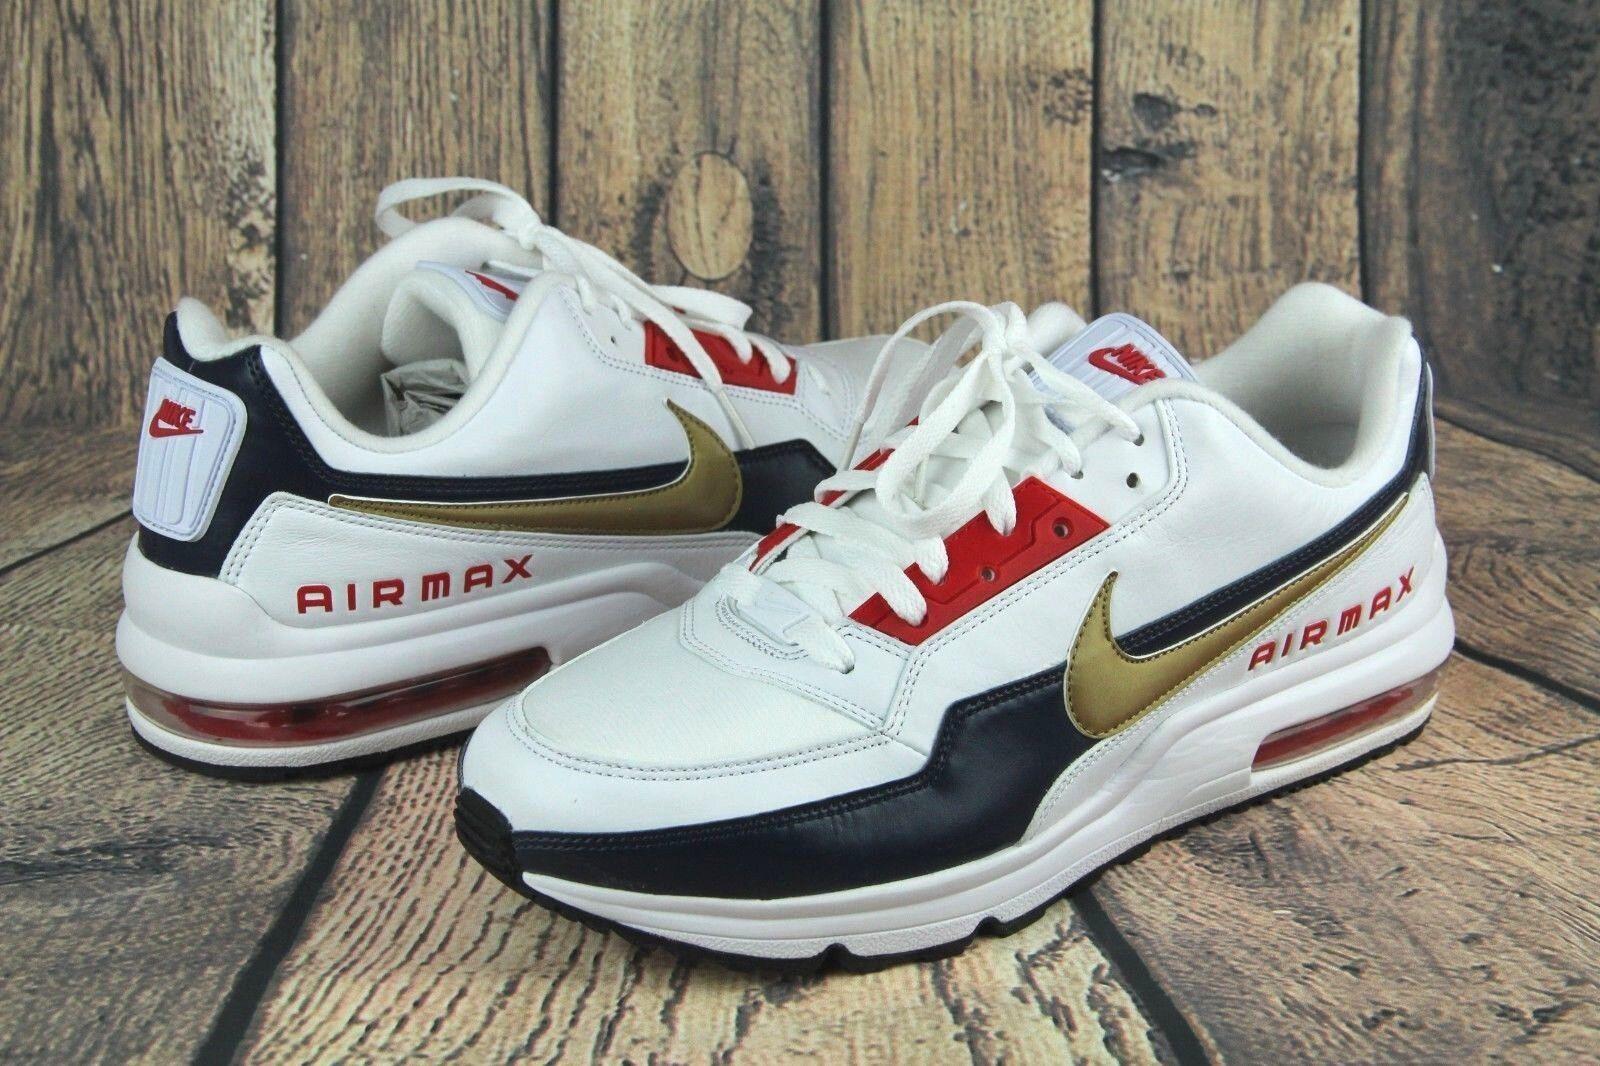 Nike Air Max LTD 3 Premium USA Olympics White/Gold Shoes 695484-186 Men's Sz * Seasonal clearance sale